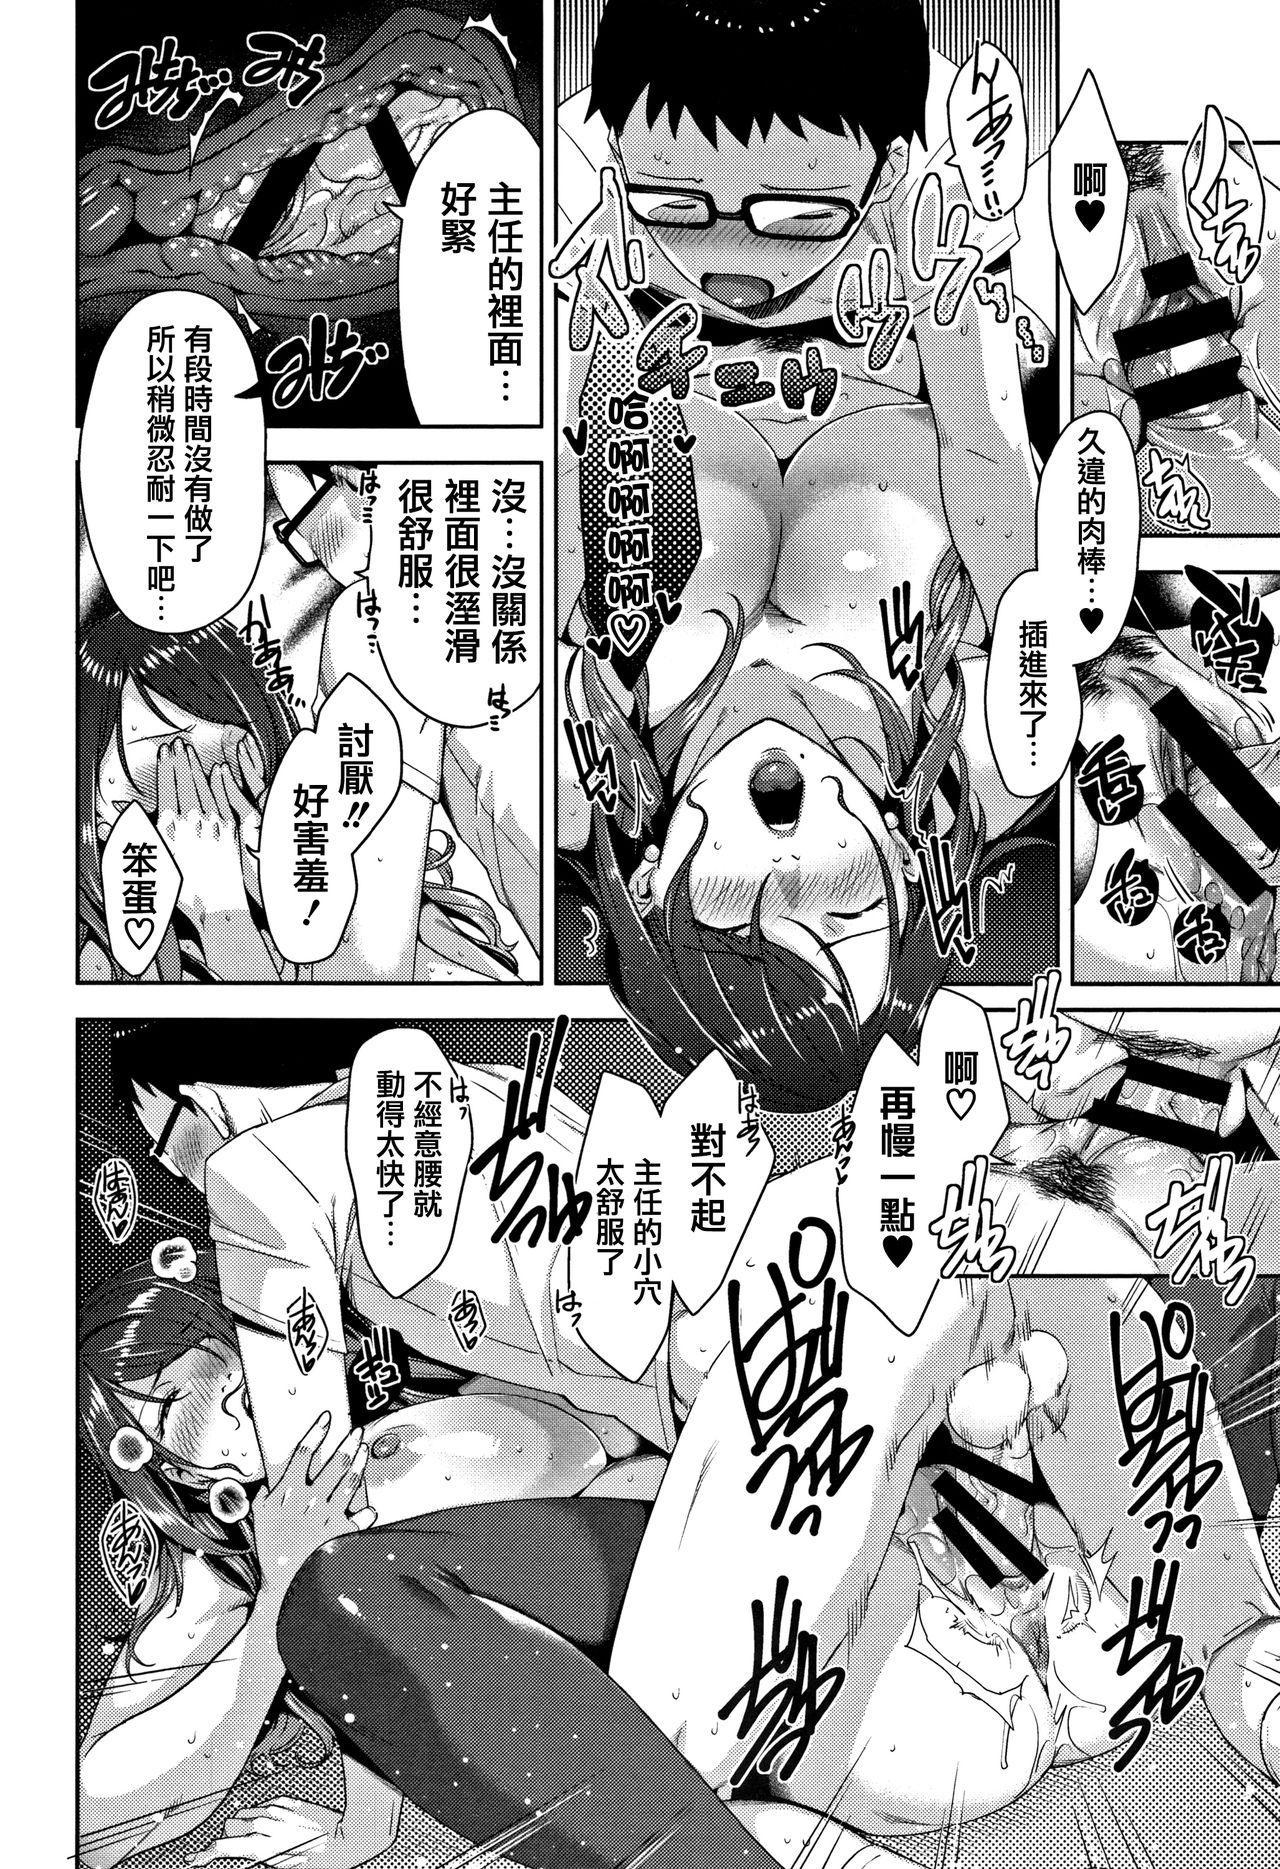 Kanjyuku Chijyo 107